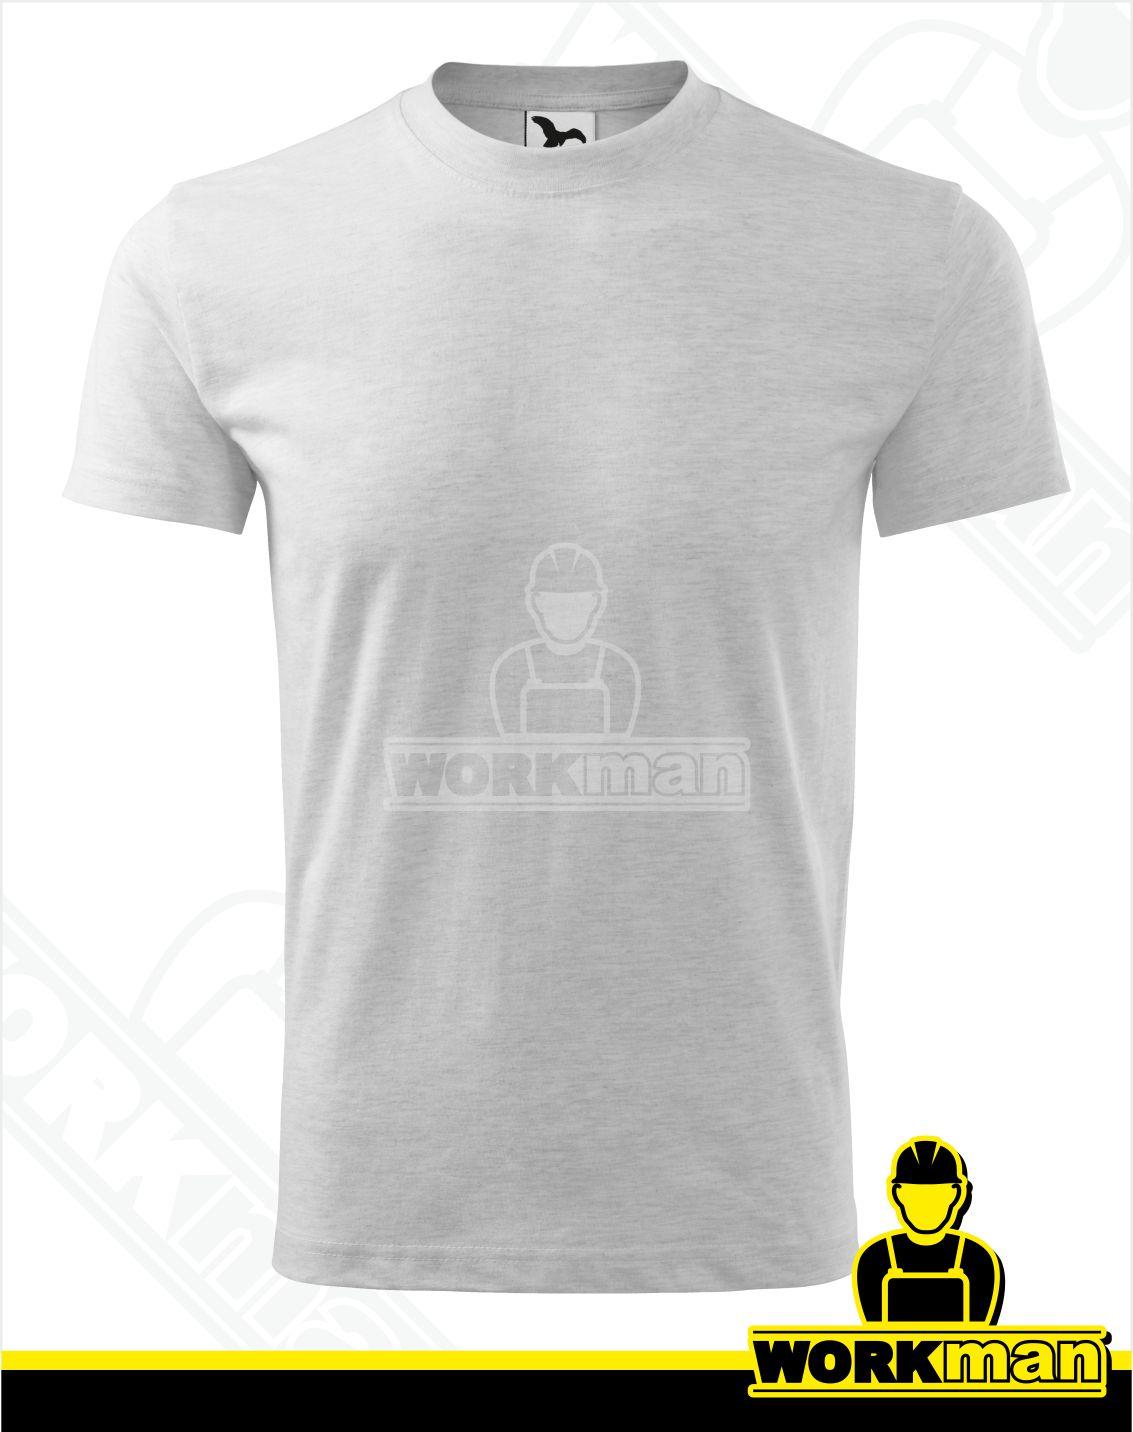 9d31ce146246 Unisex tričko HEAVY Malfini Pracovné odevy WORKMAN